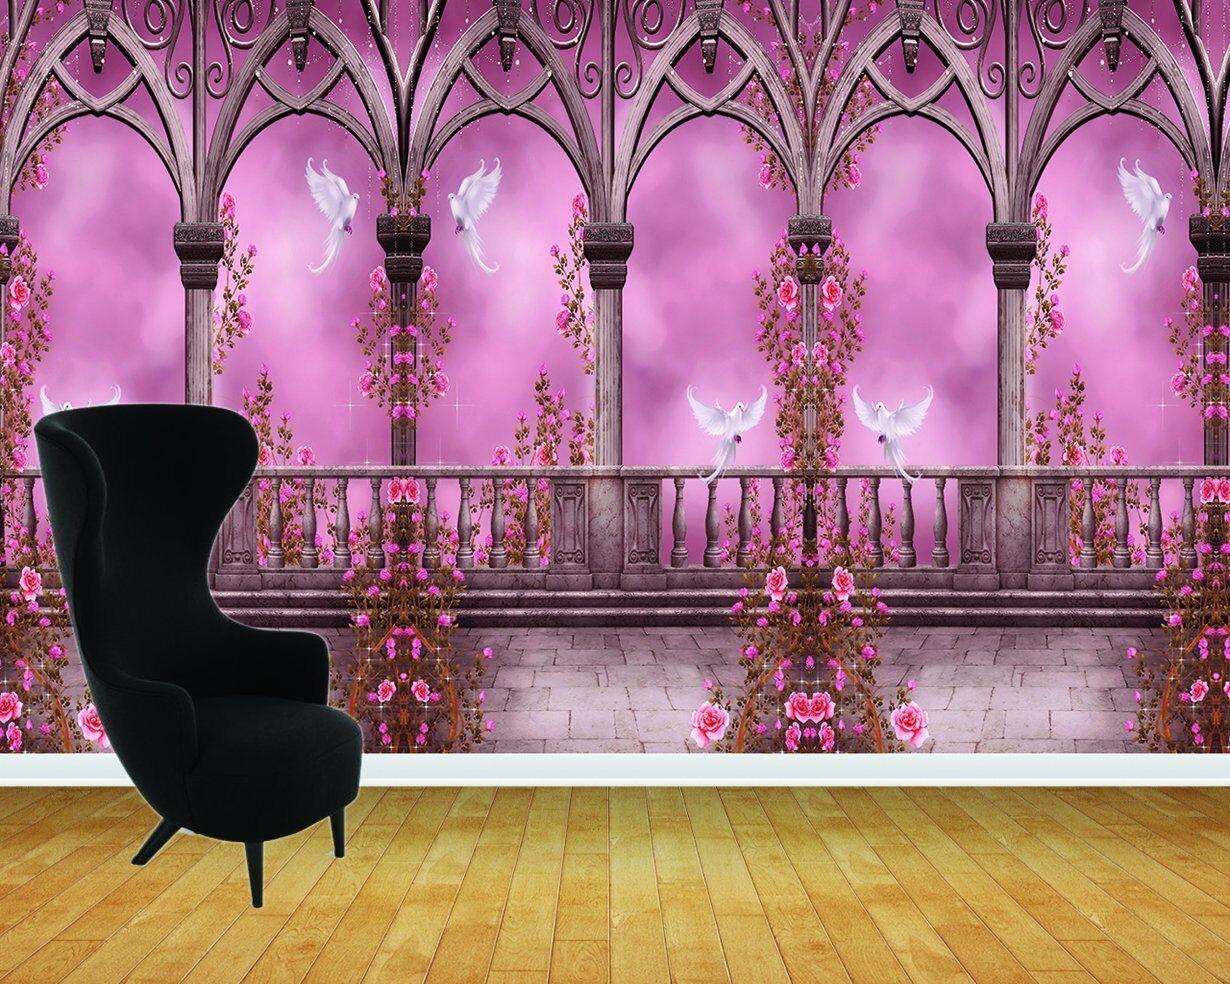 Enchanted Castle Arches Ballroom Ballroom Ballroom Wall Art Mural Adhésif Vinyle Papier Peint | Beau  | La Mode De  | Attrayant De Mode  4db021